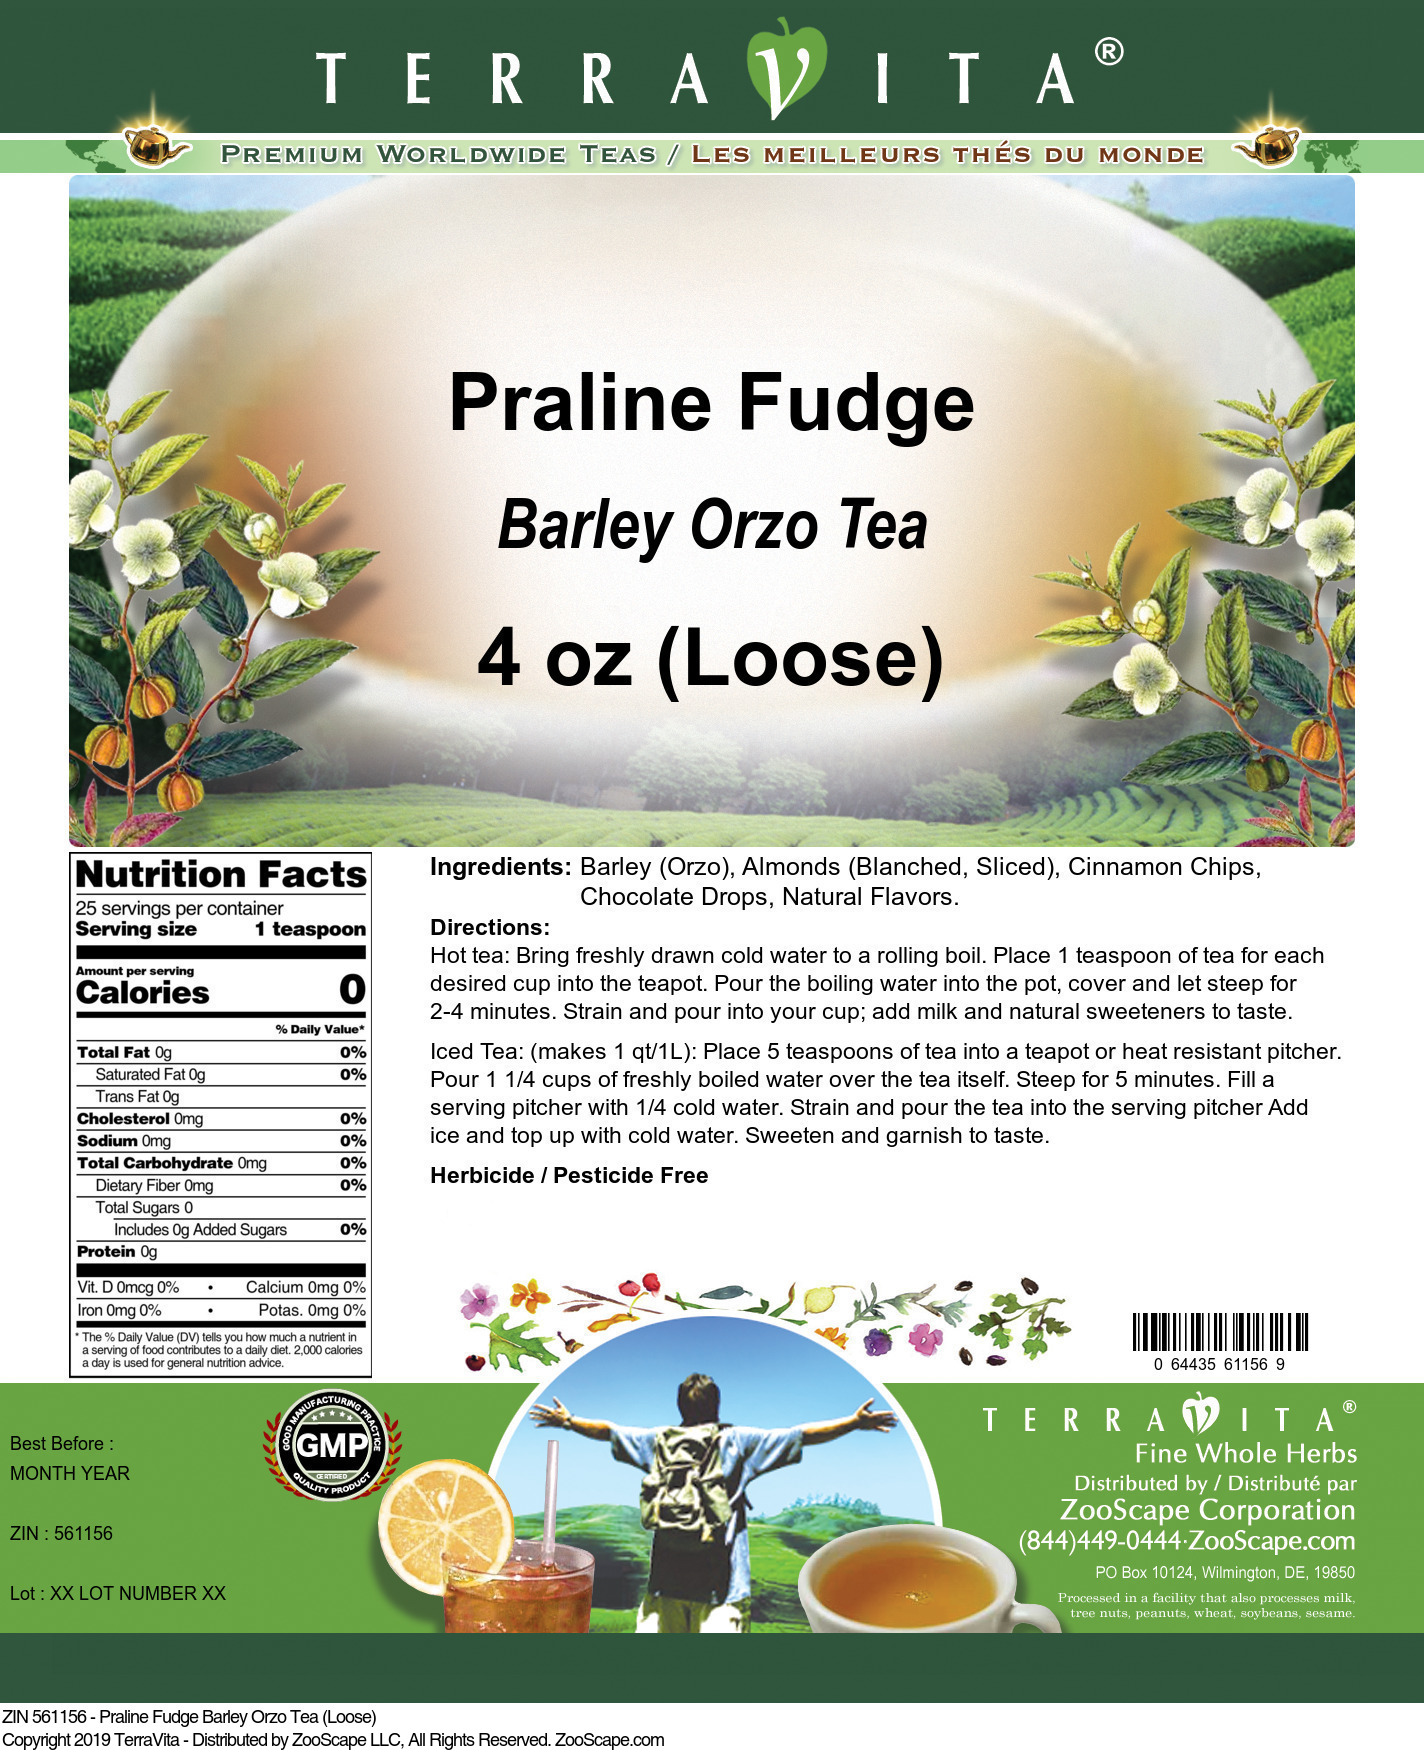 Praline Fudge Barley Orzo